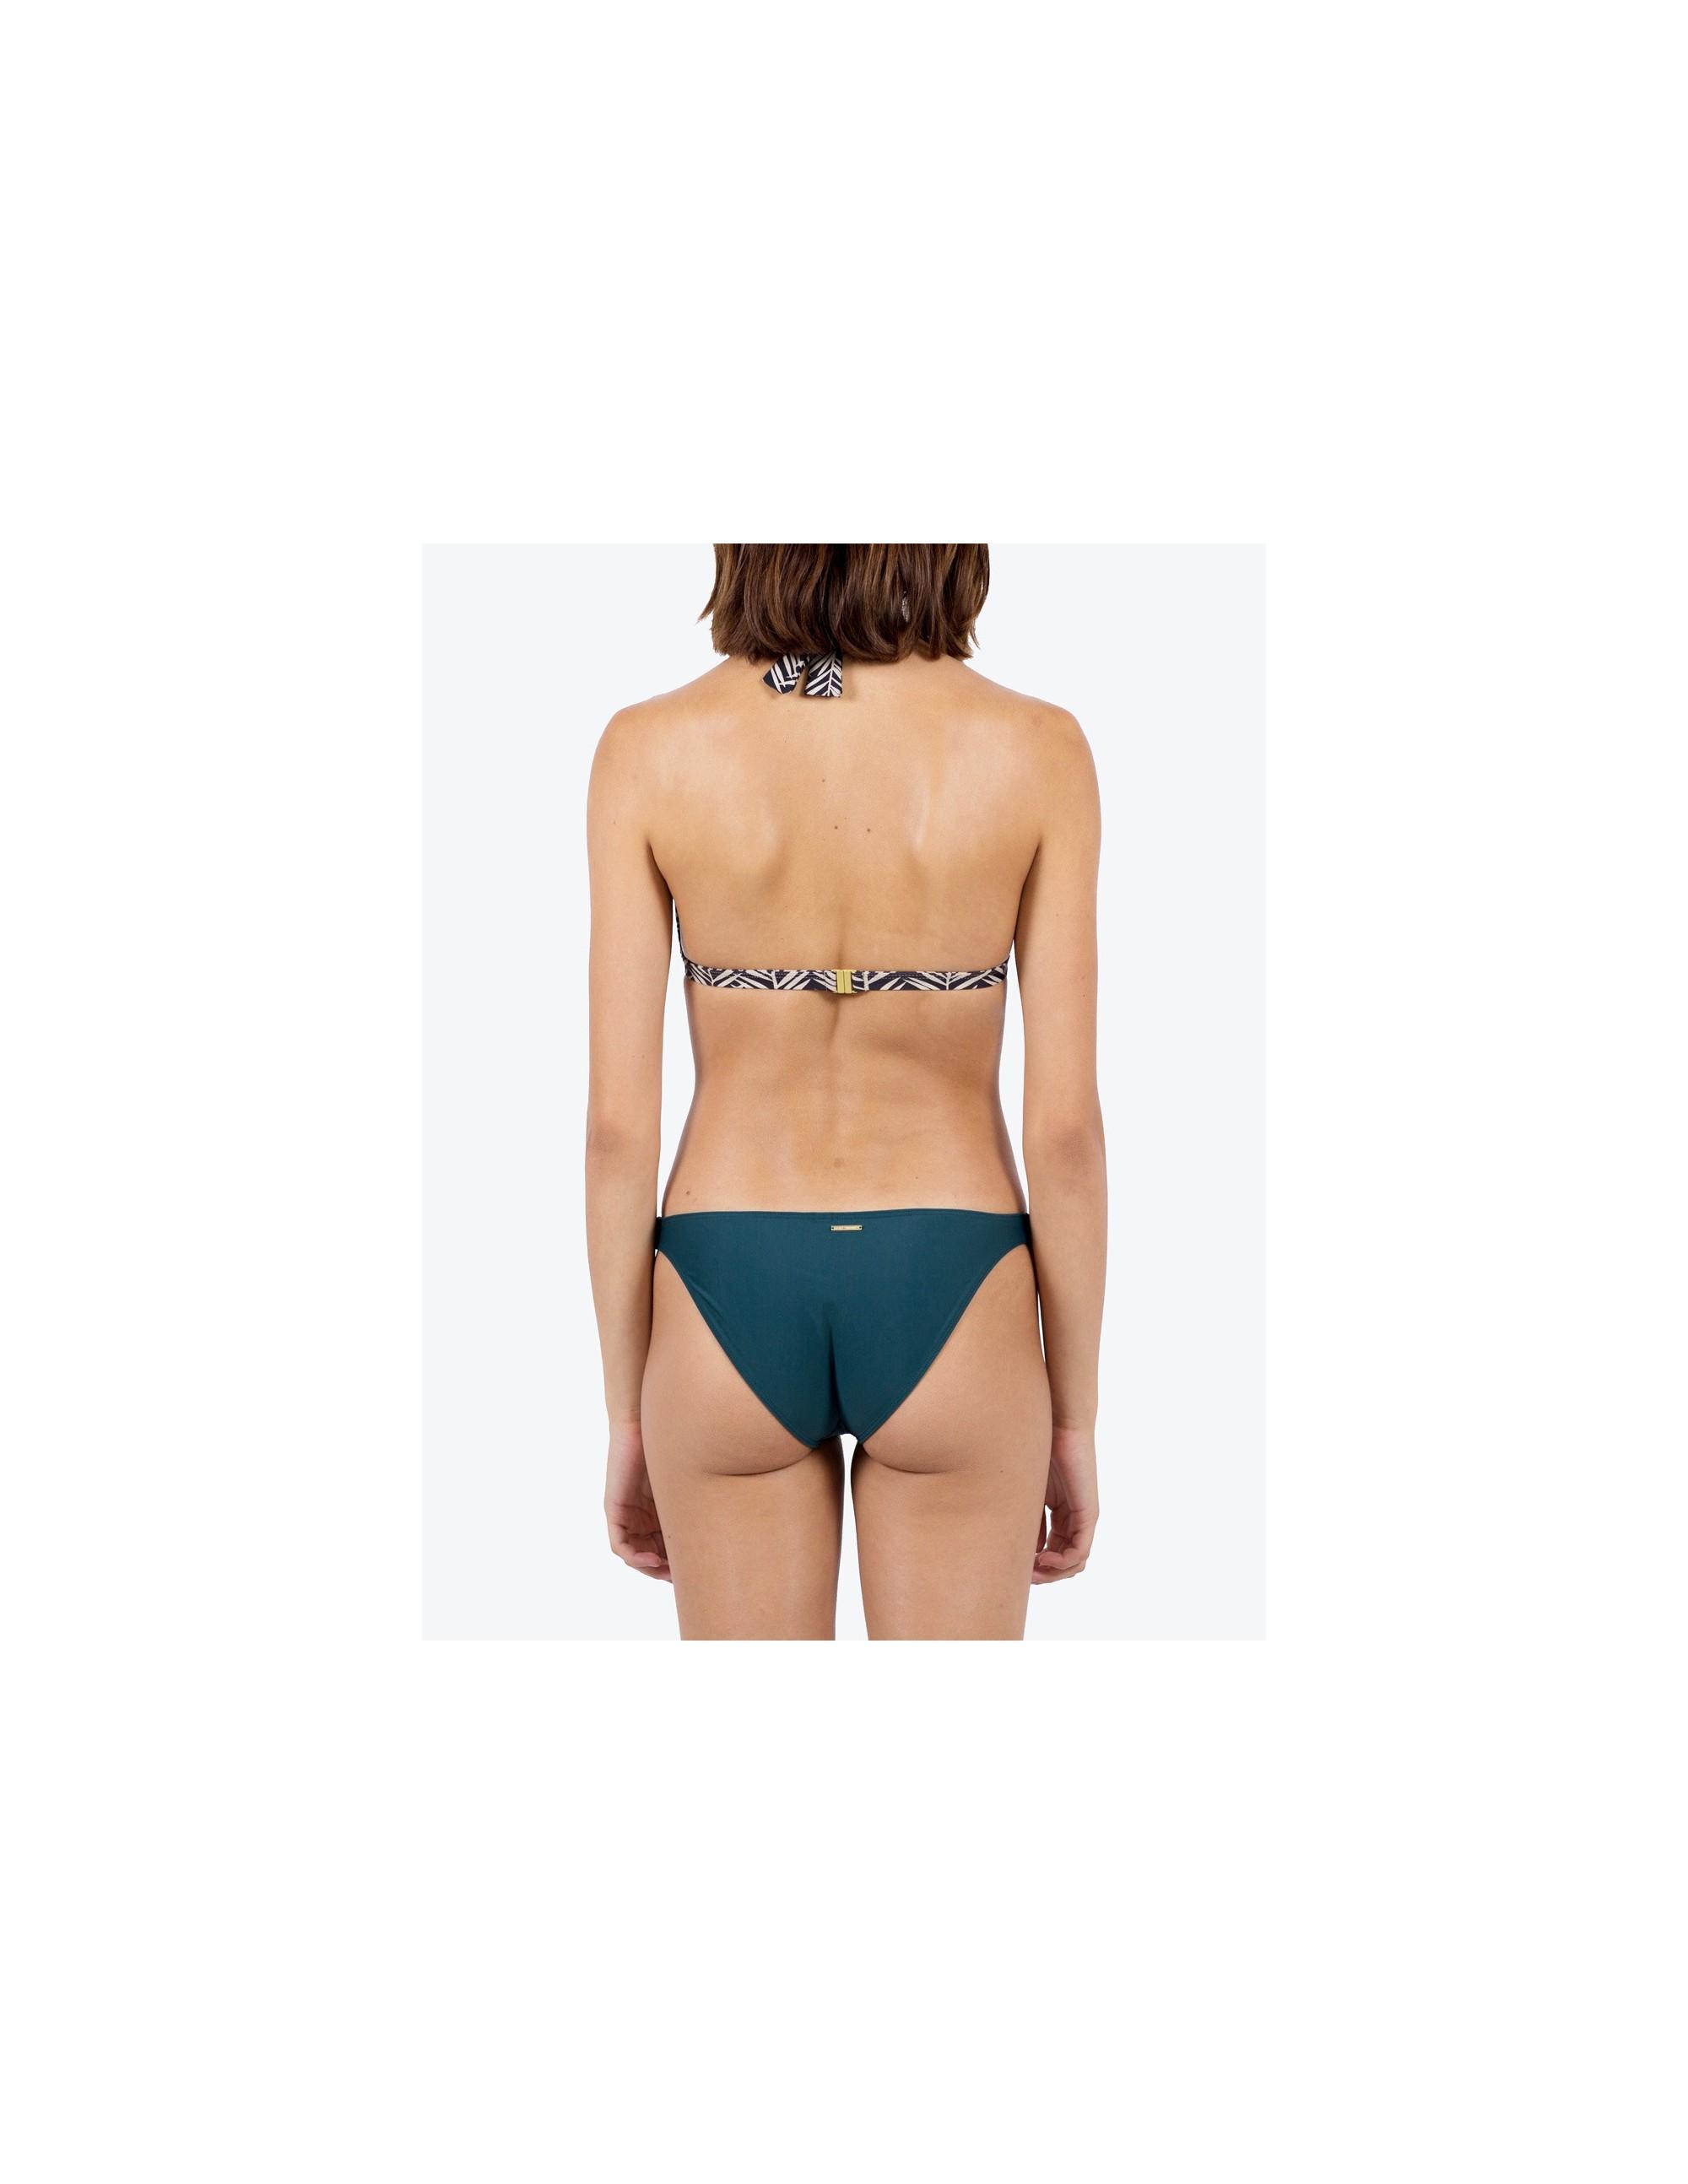 CONTA bikini top - TROPICAL BREEZE